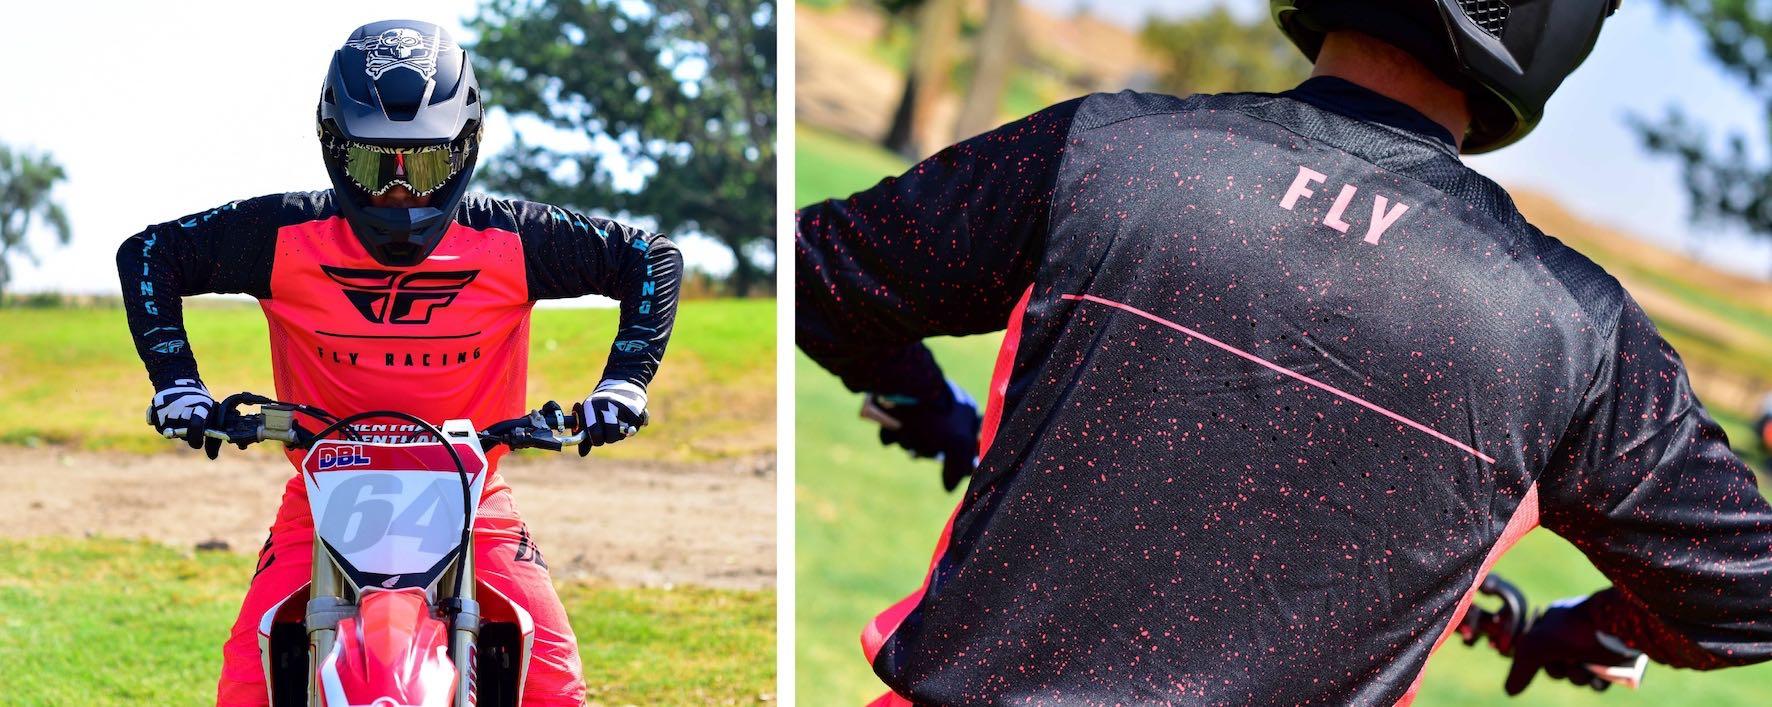 2020 Fly Lite Motocross Racewear jersey features